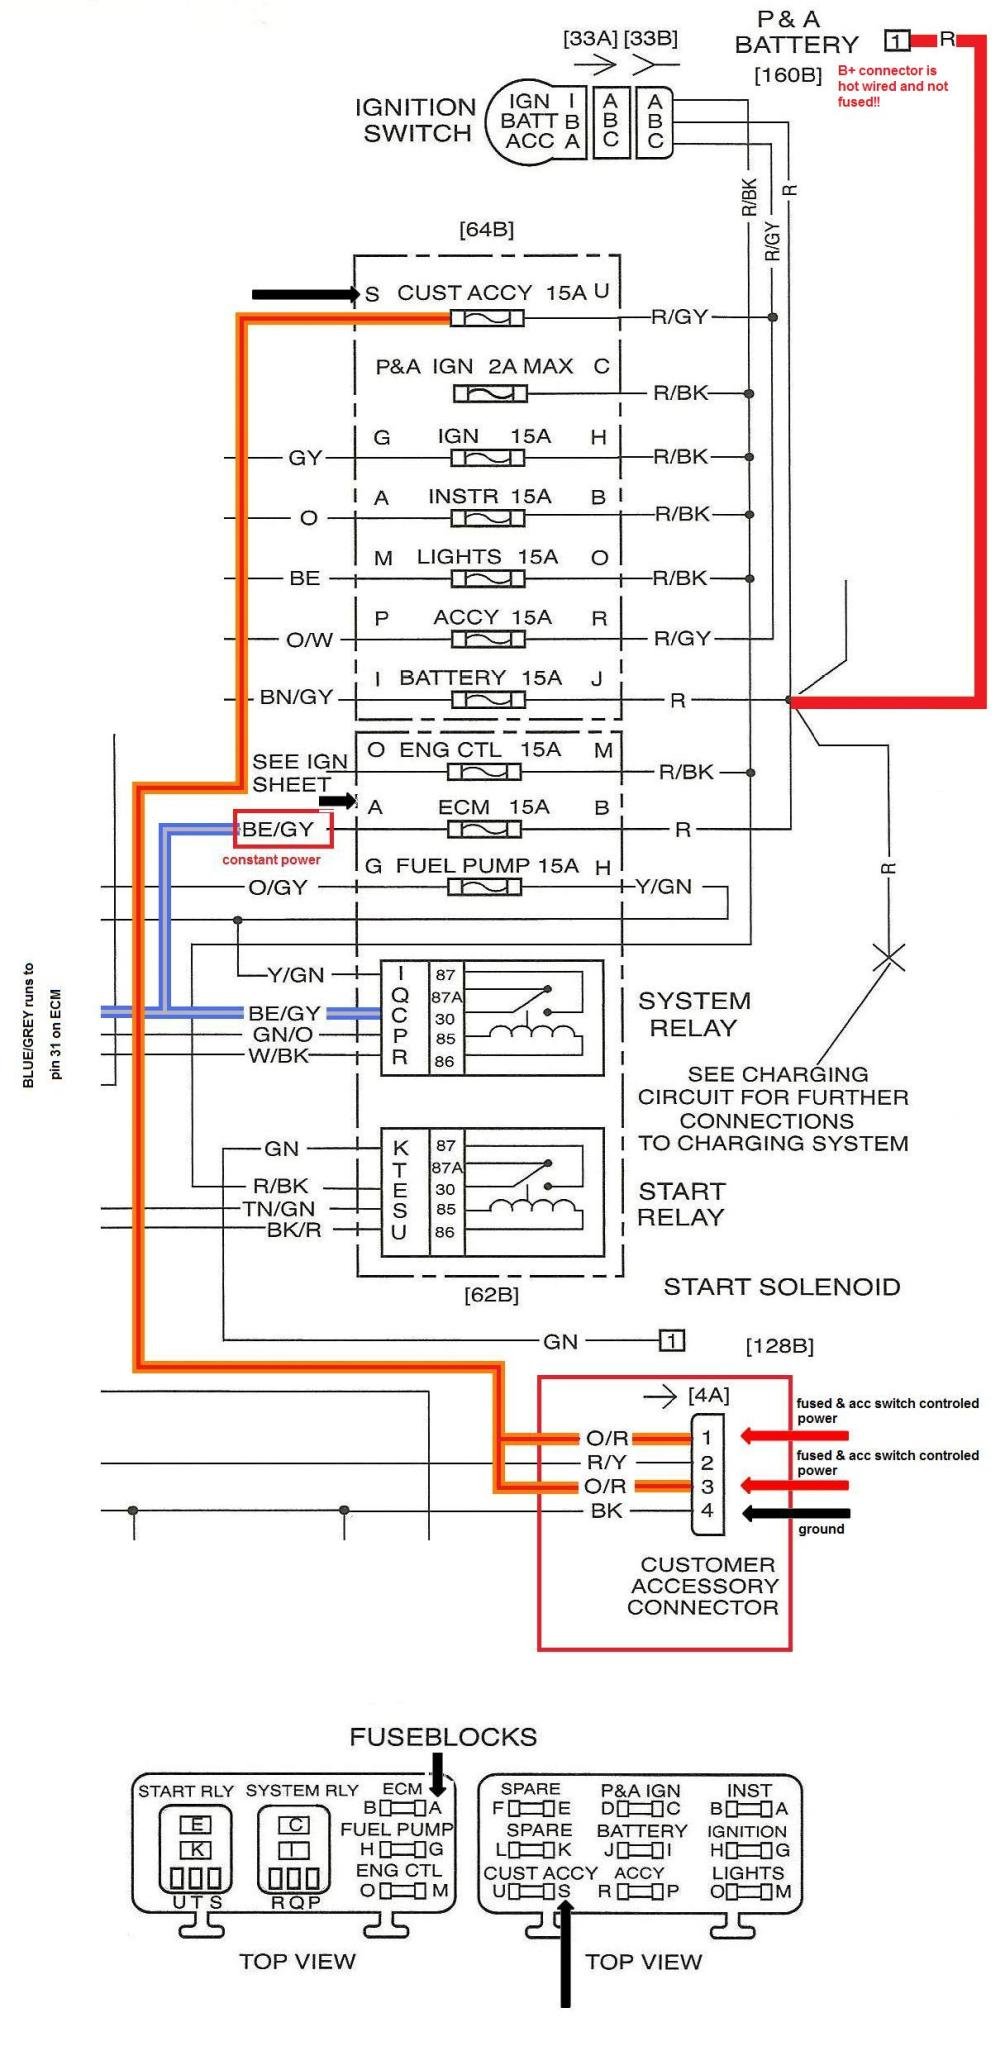 Wiring Diagram 2005 Harley Davidson Dyna Low harley davidson ... on